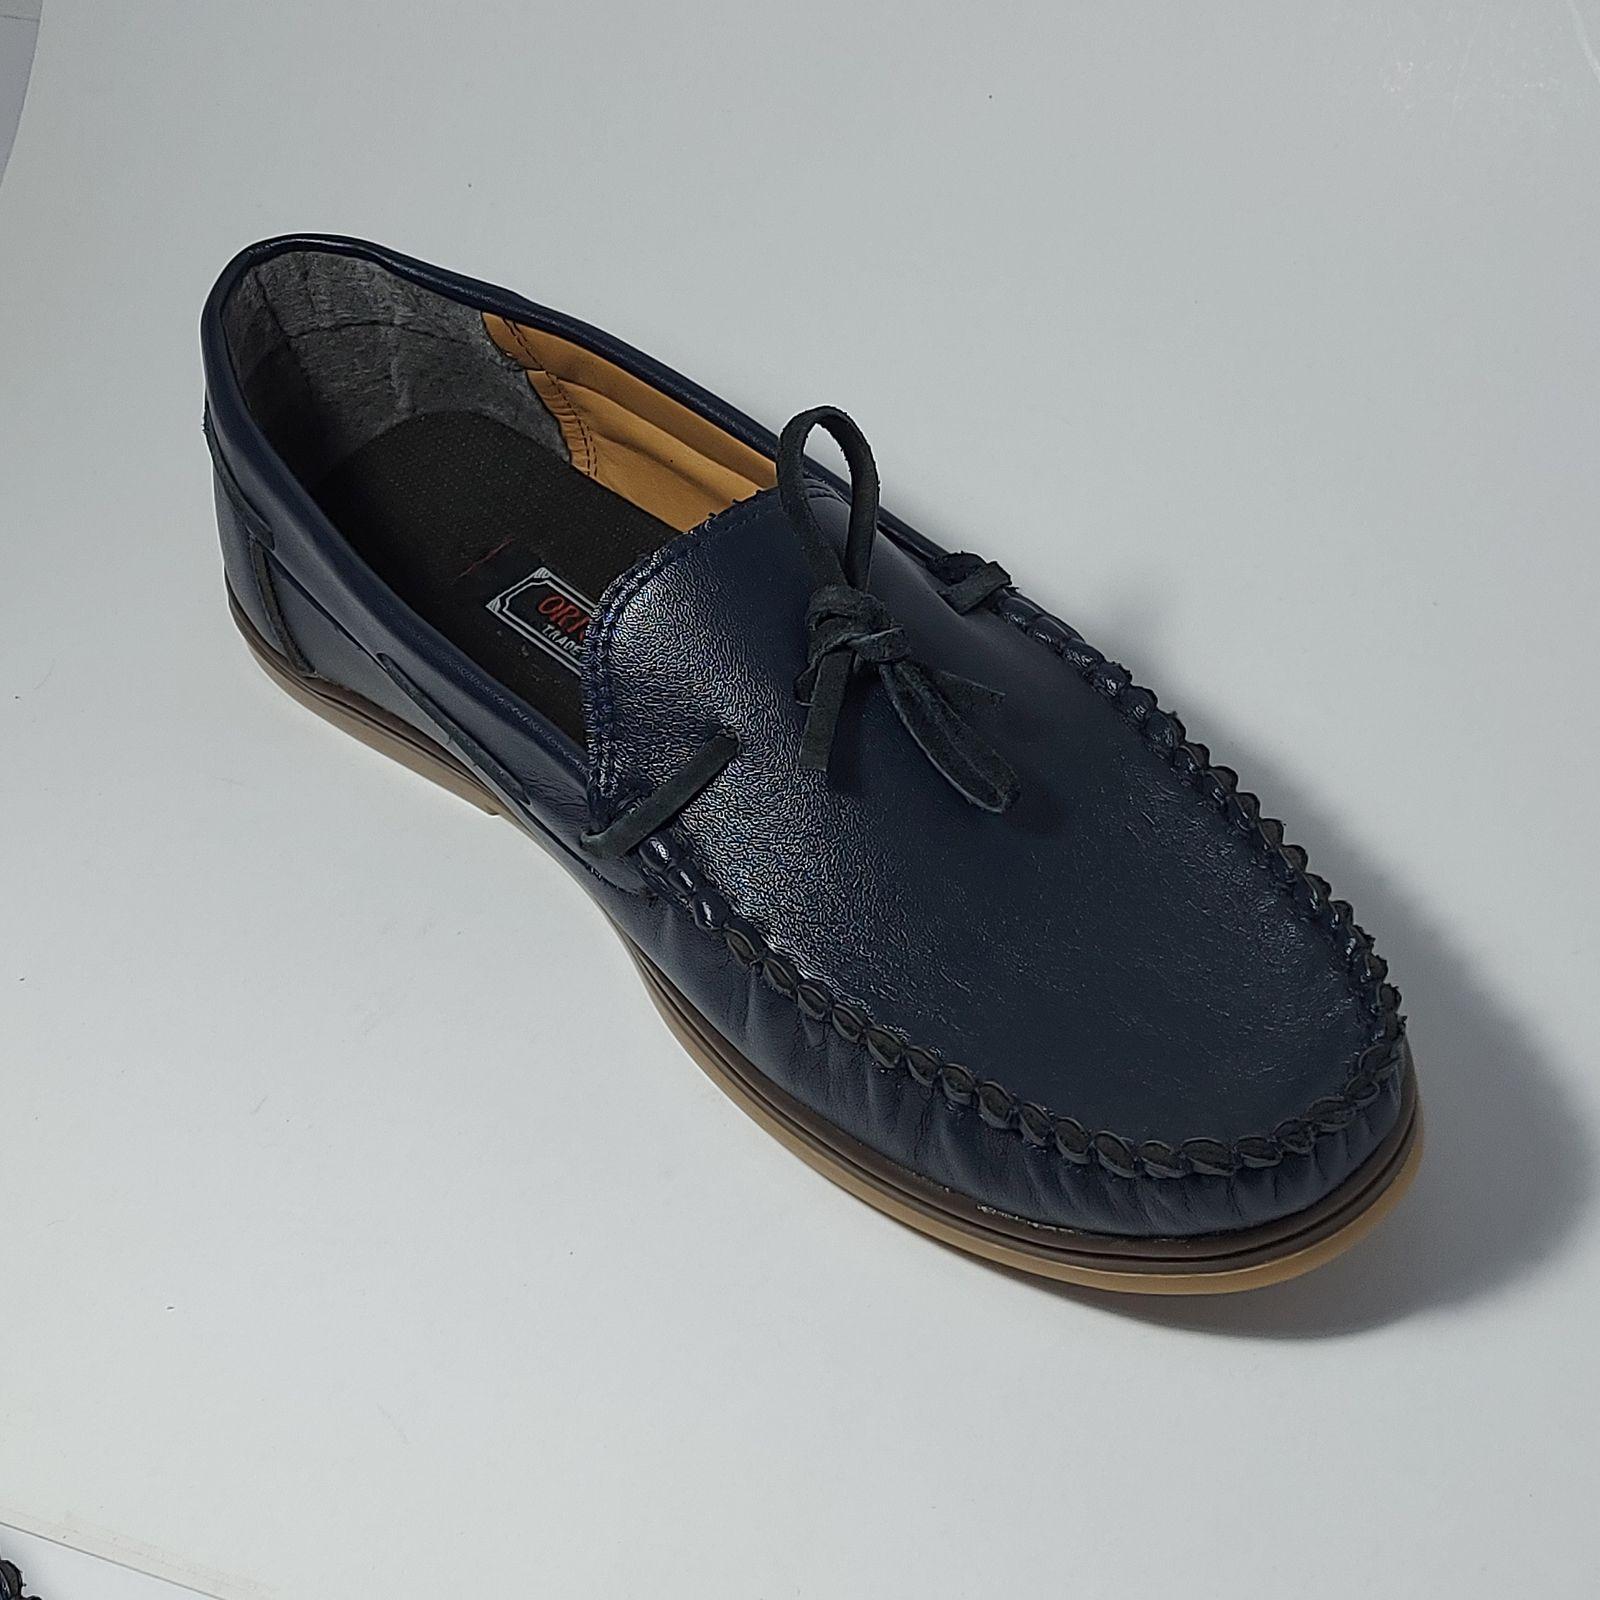 کفش روزمره مردانه مدل CH001 -  - 3